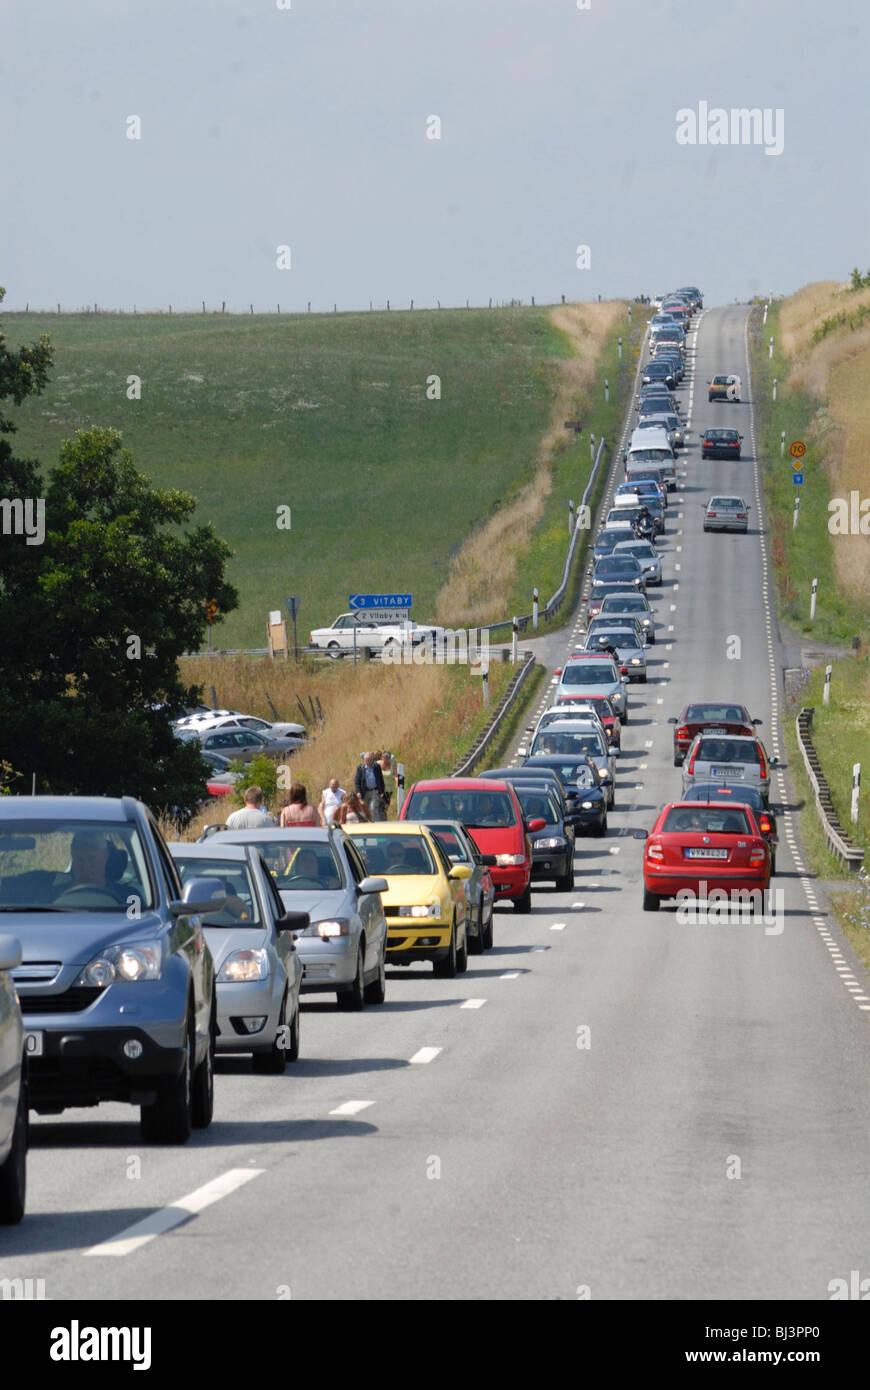 Queue de voitures sur une route droite, Kivik, Schonen, Schweden, Scandinavie, Europe Banque D'Images